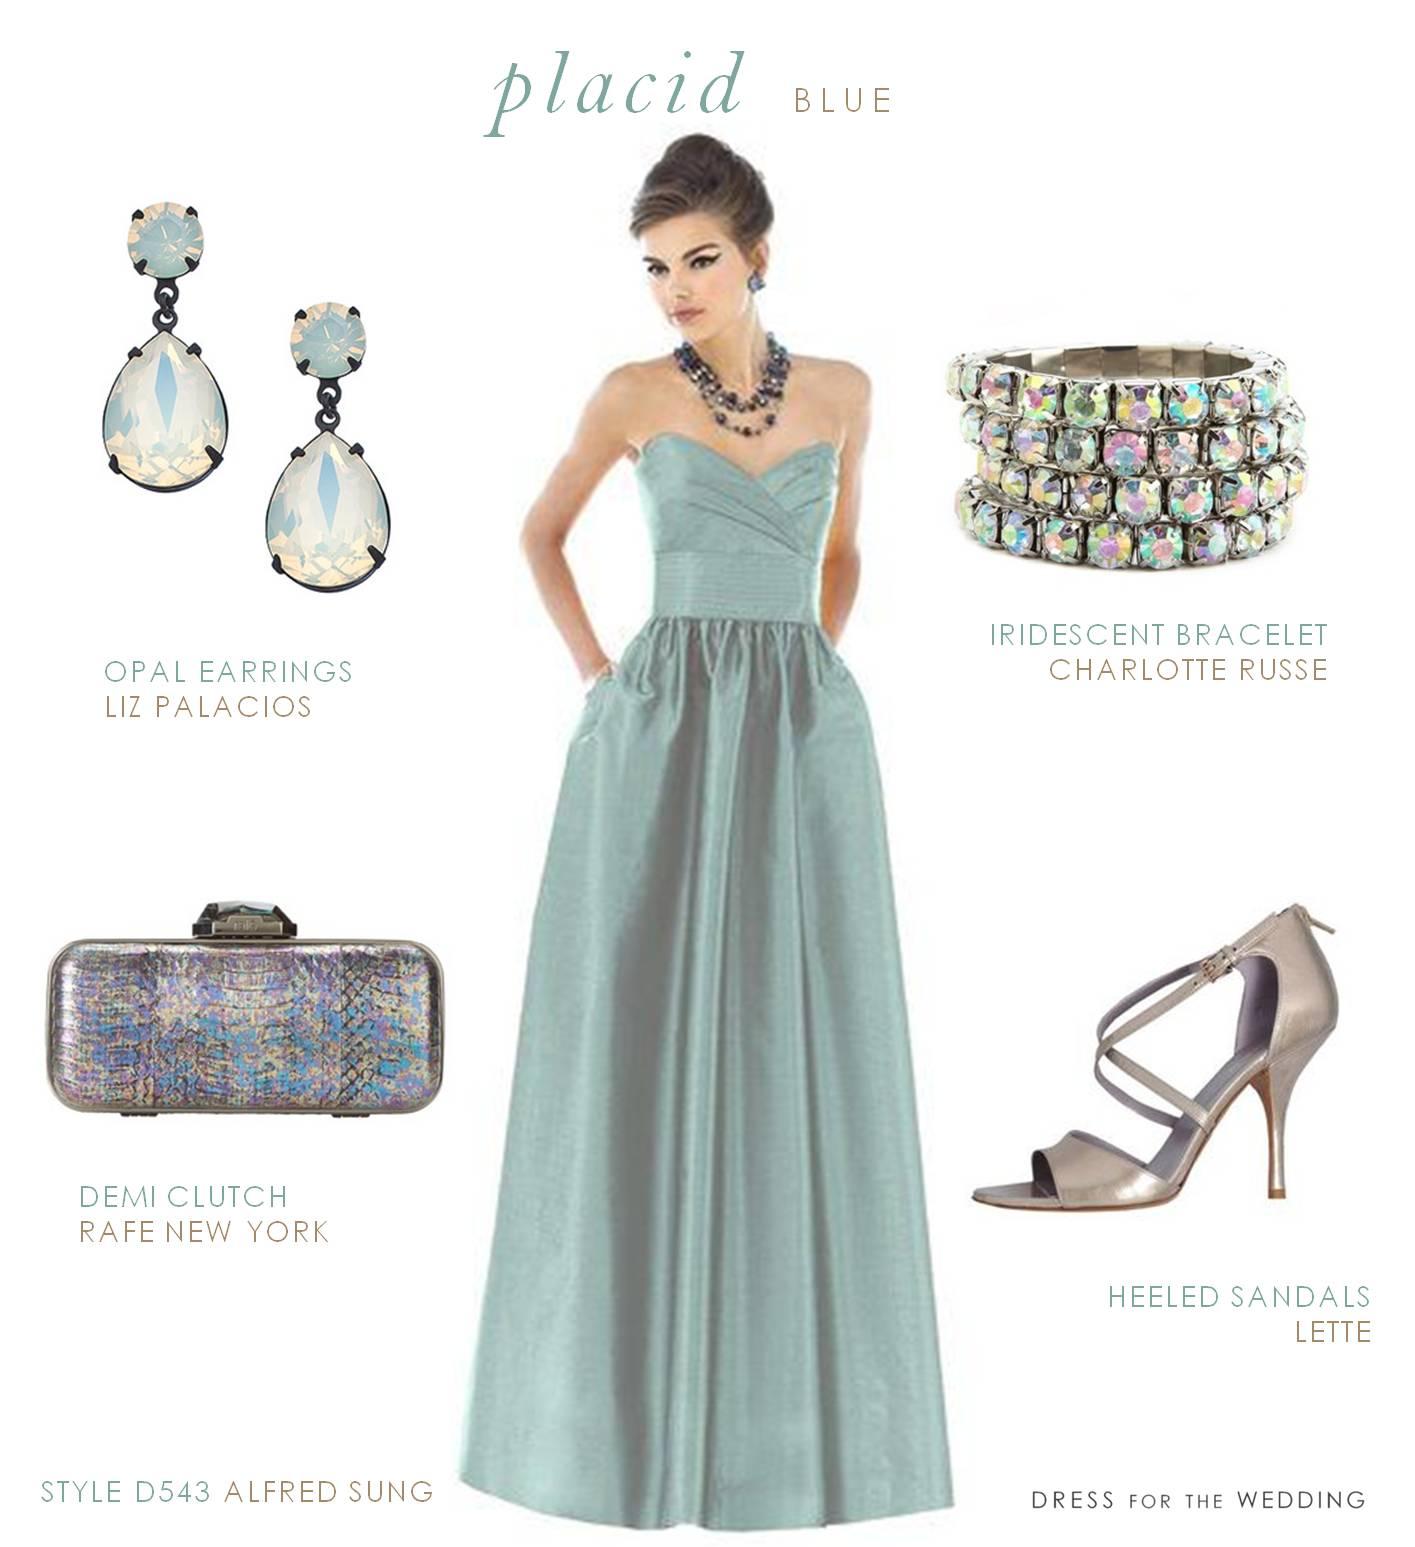 Placid Blue Wedding Style